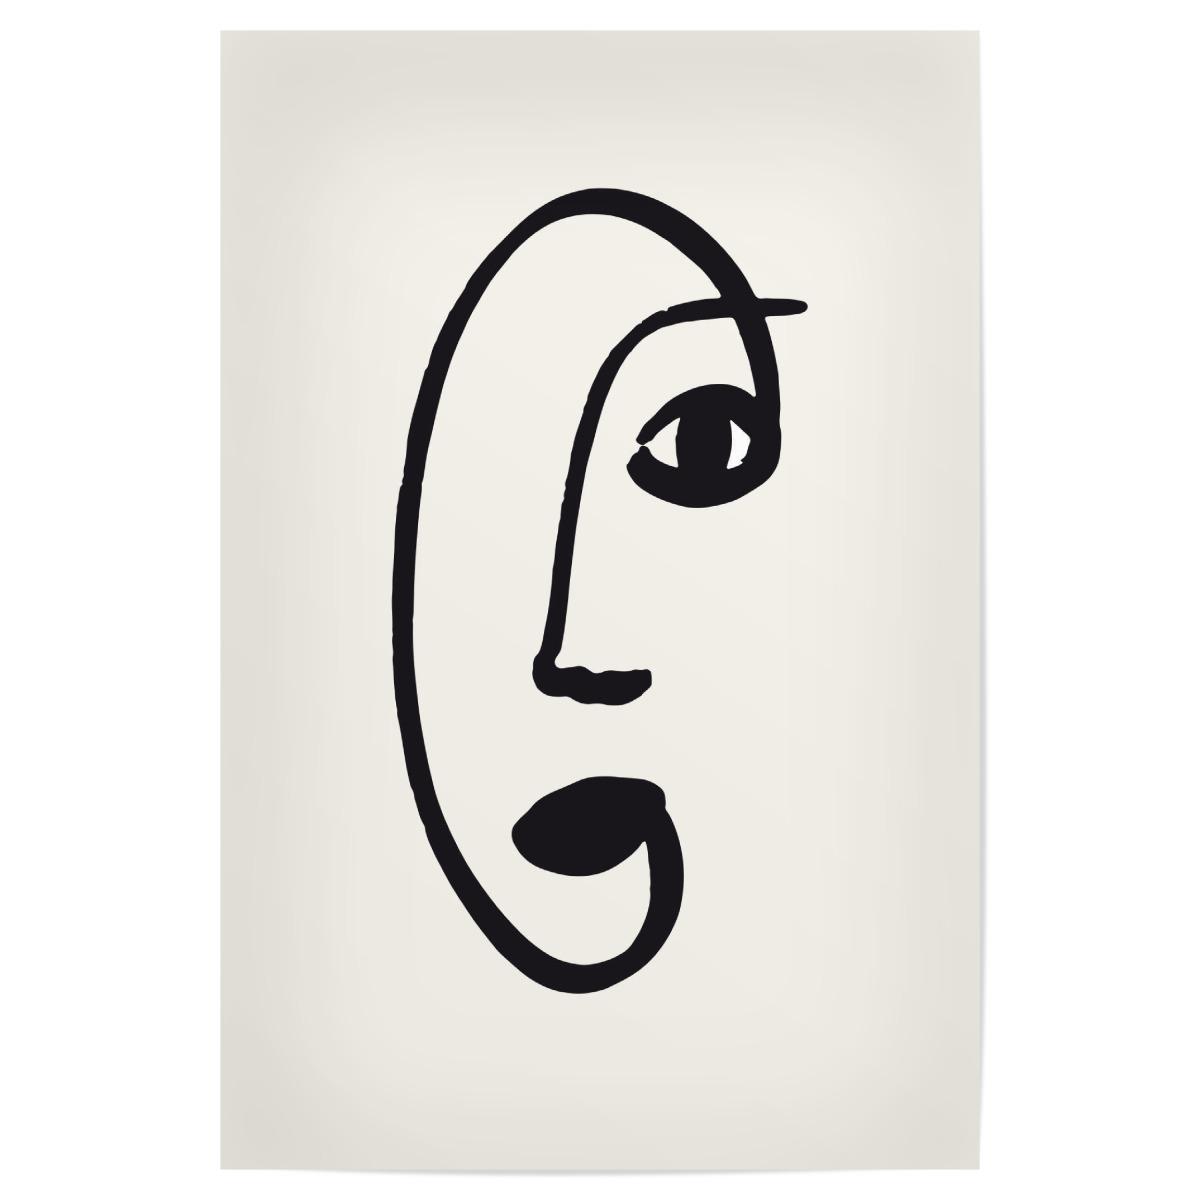 Line Art Face 20x20 cm Poster